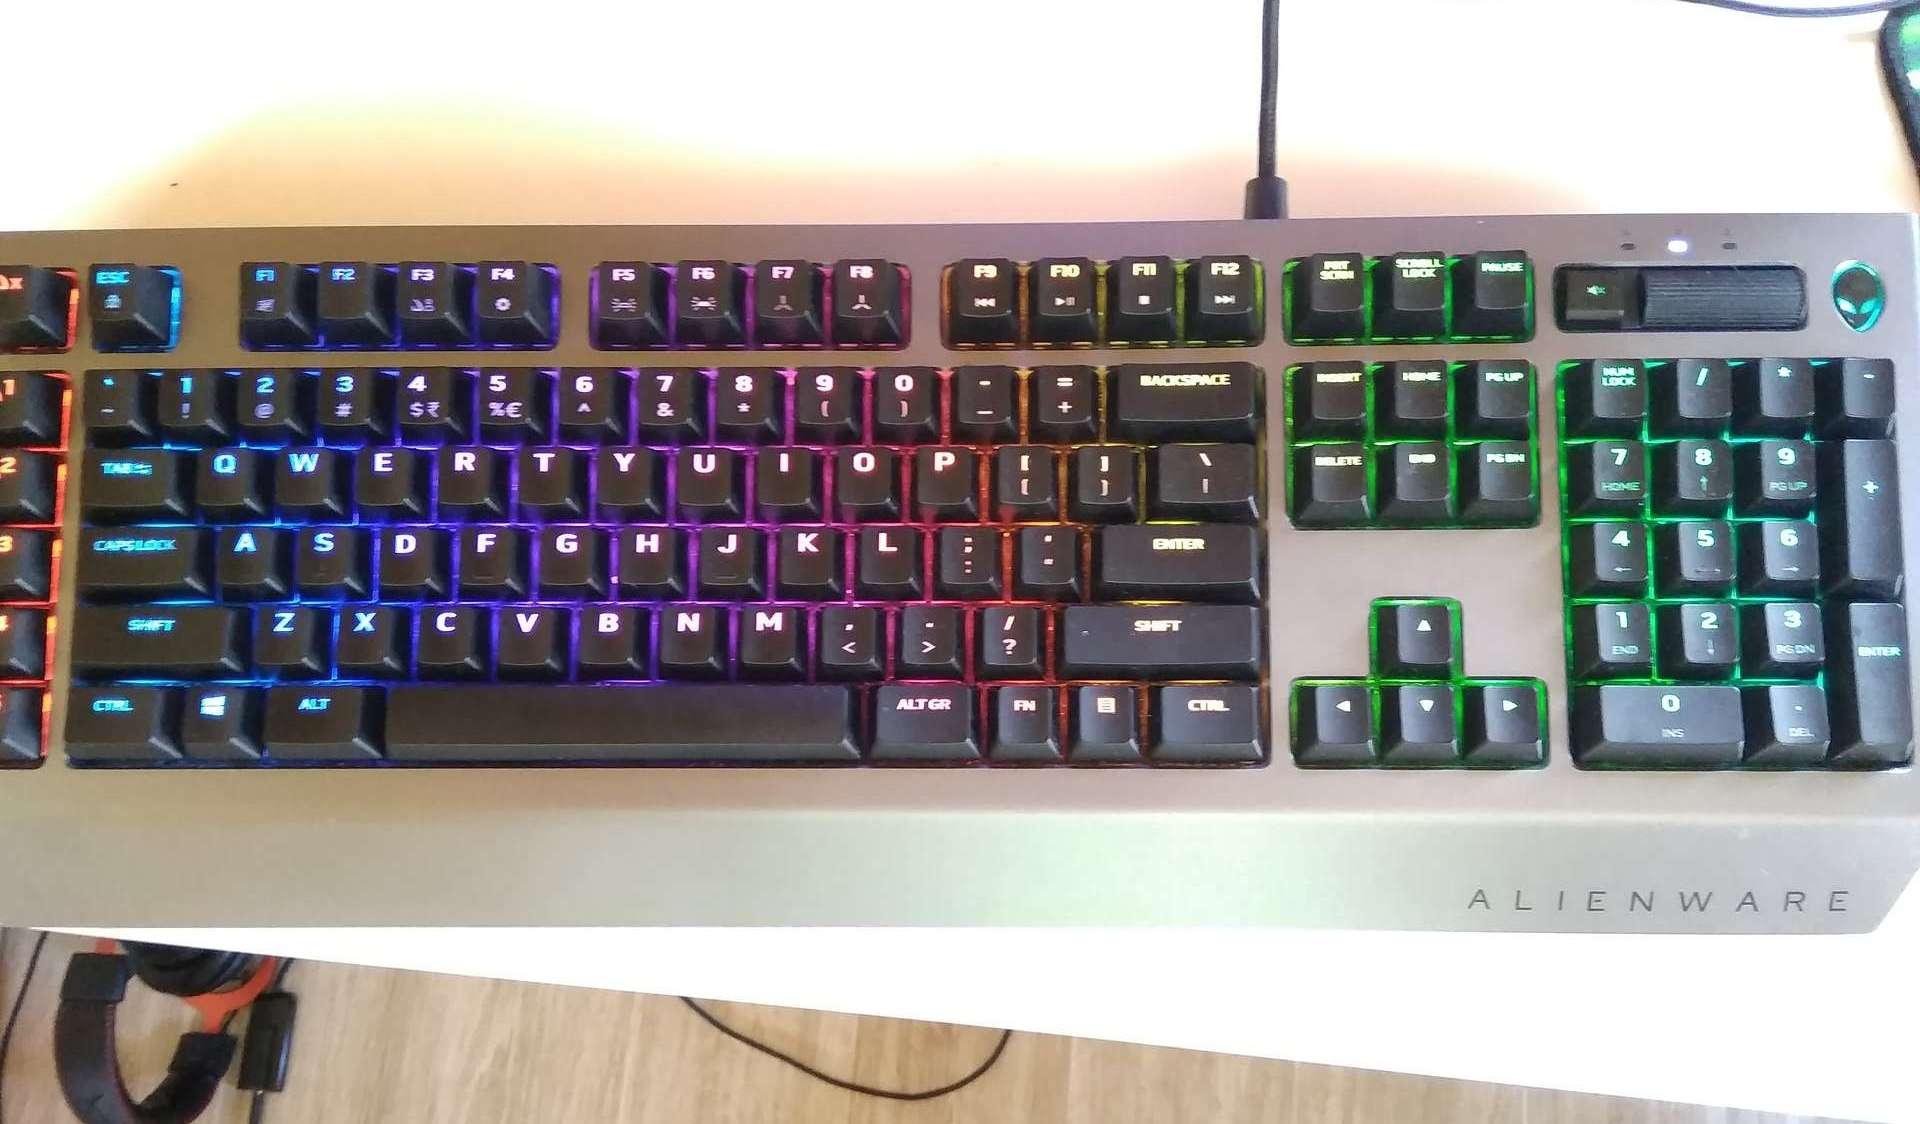 Alienware AW768 Pro